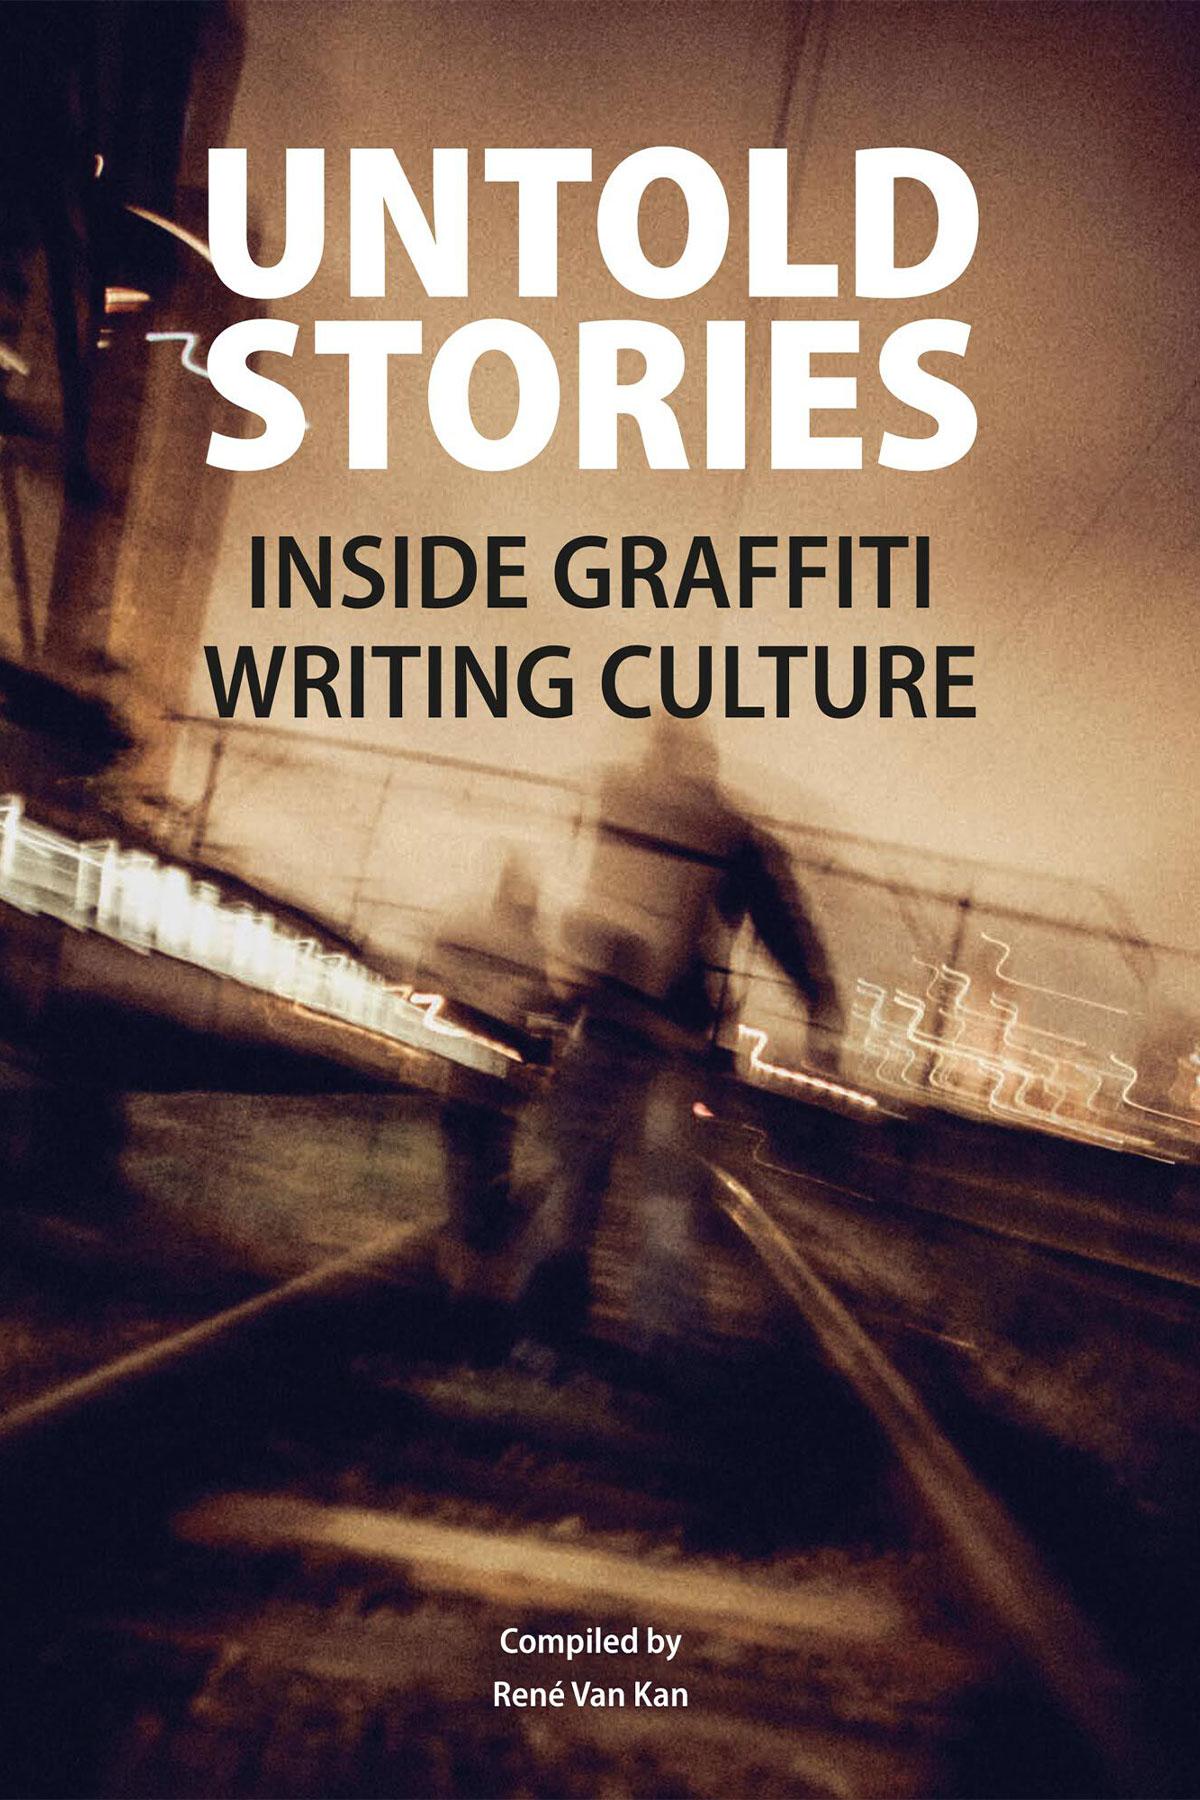 UNTOLD STORIES di René Van Kan